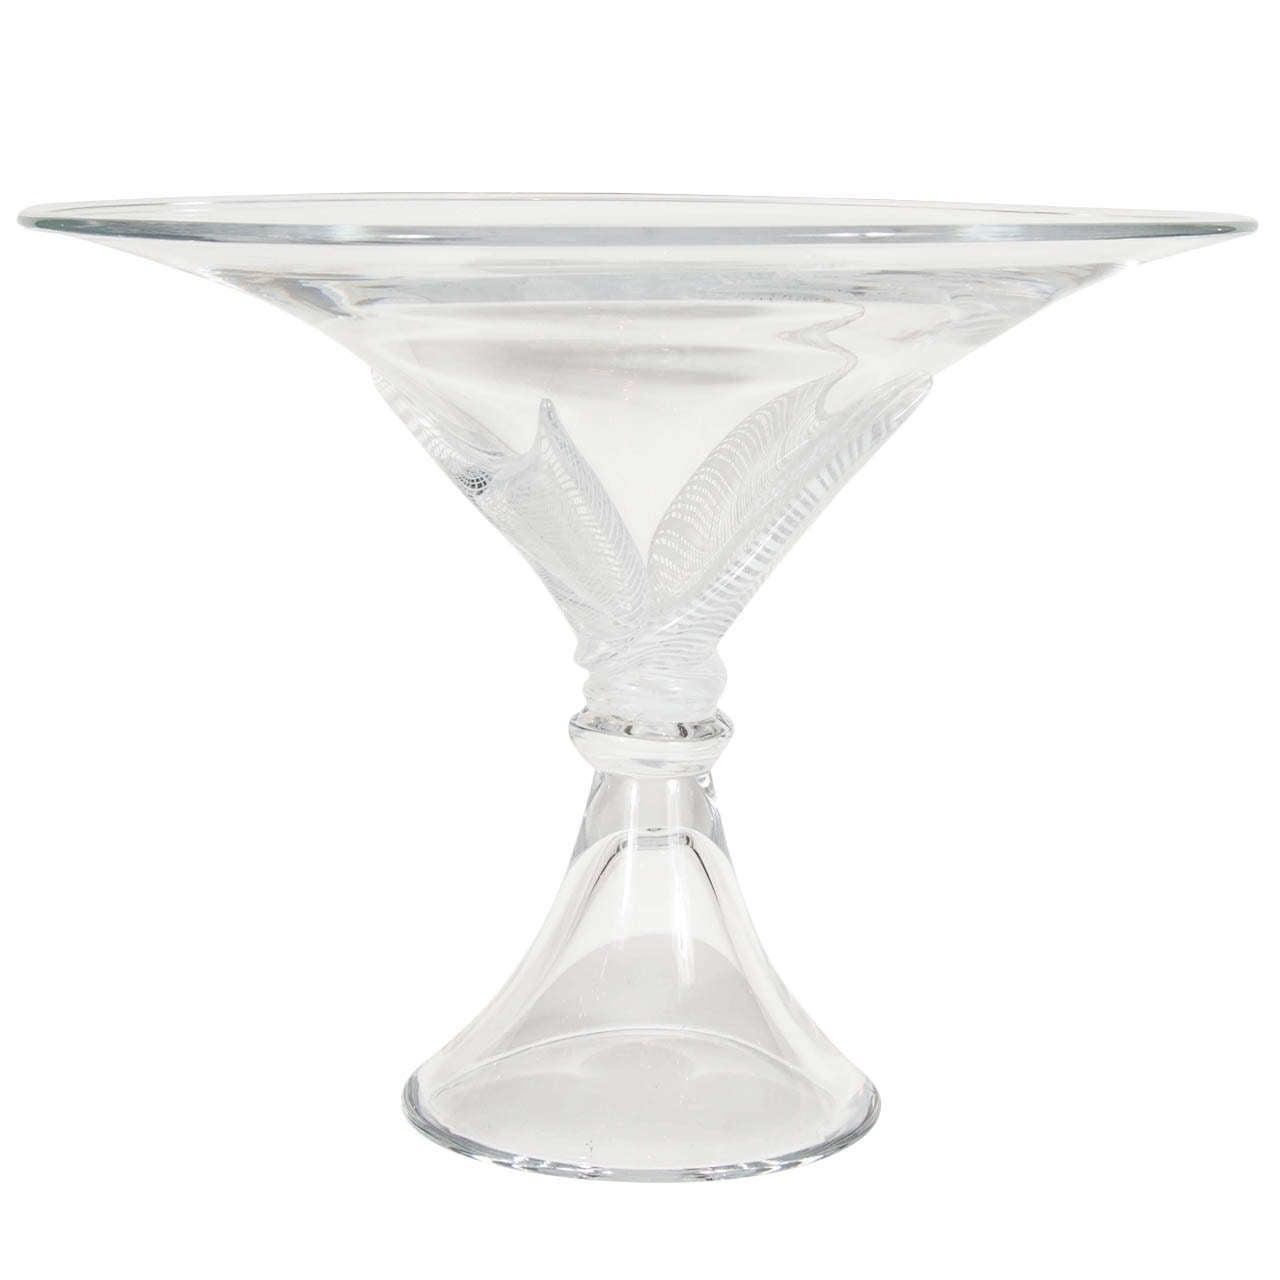 Stunning  Licio Zanetti Hand Blown Glass Footed Bowl